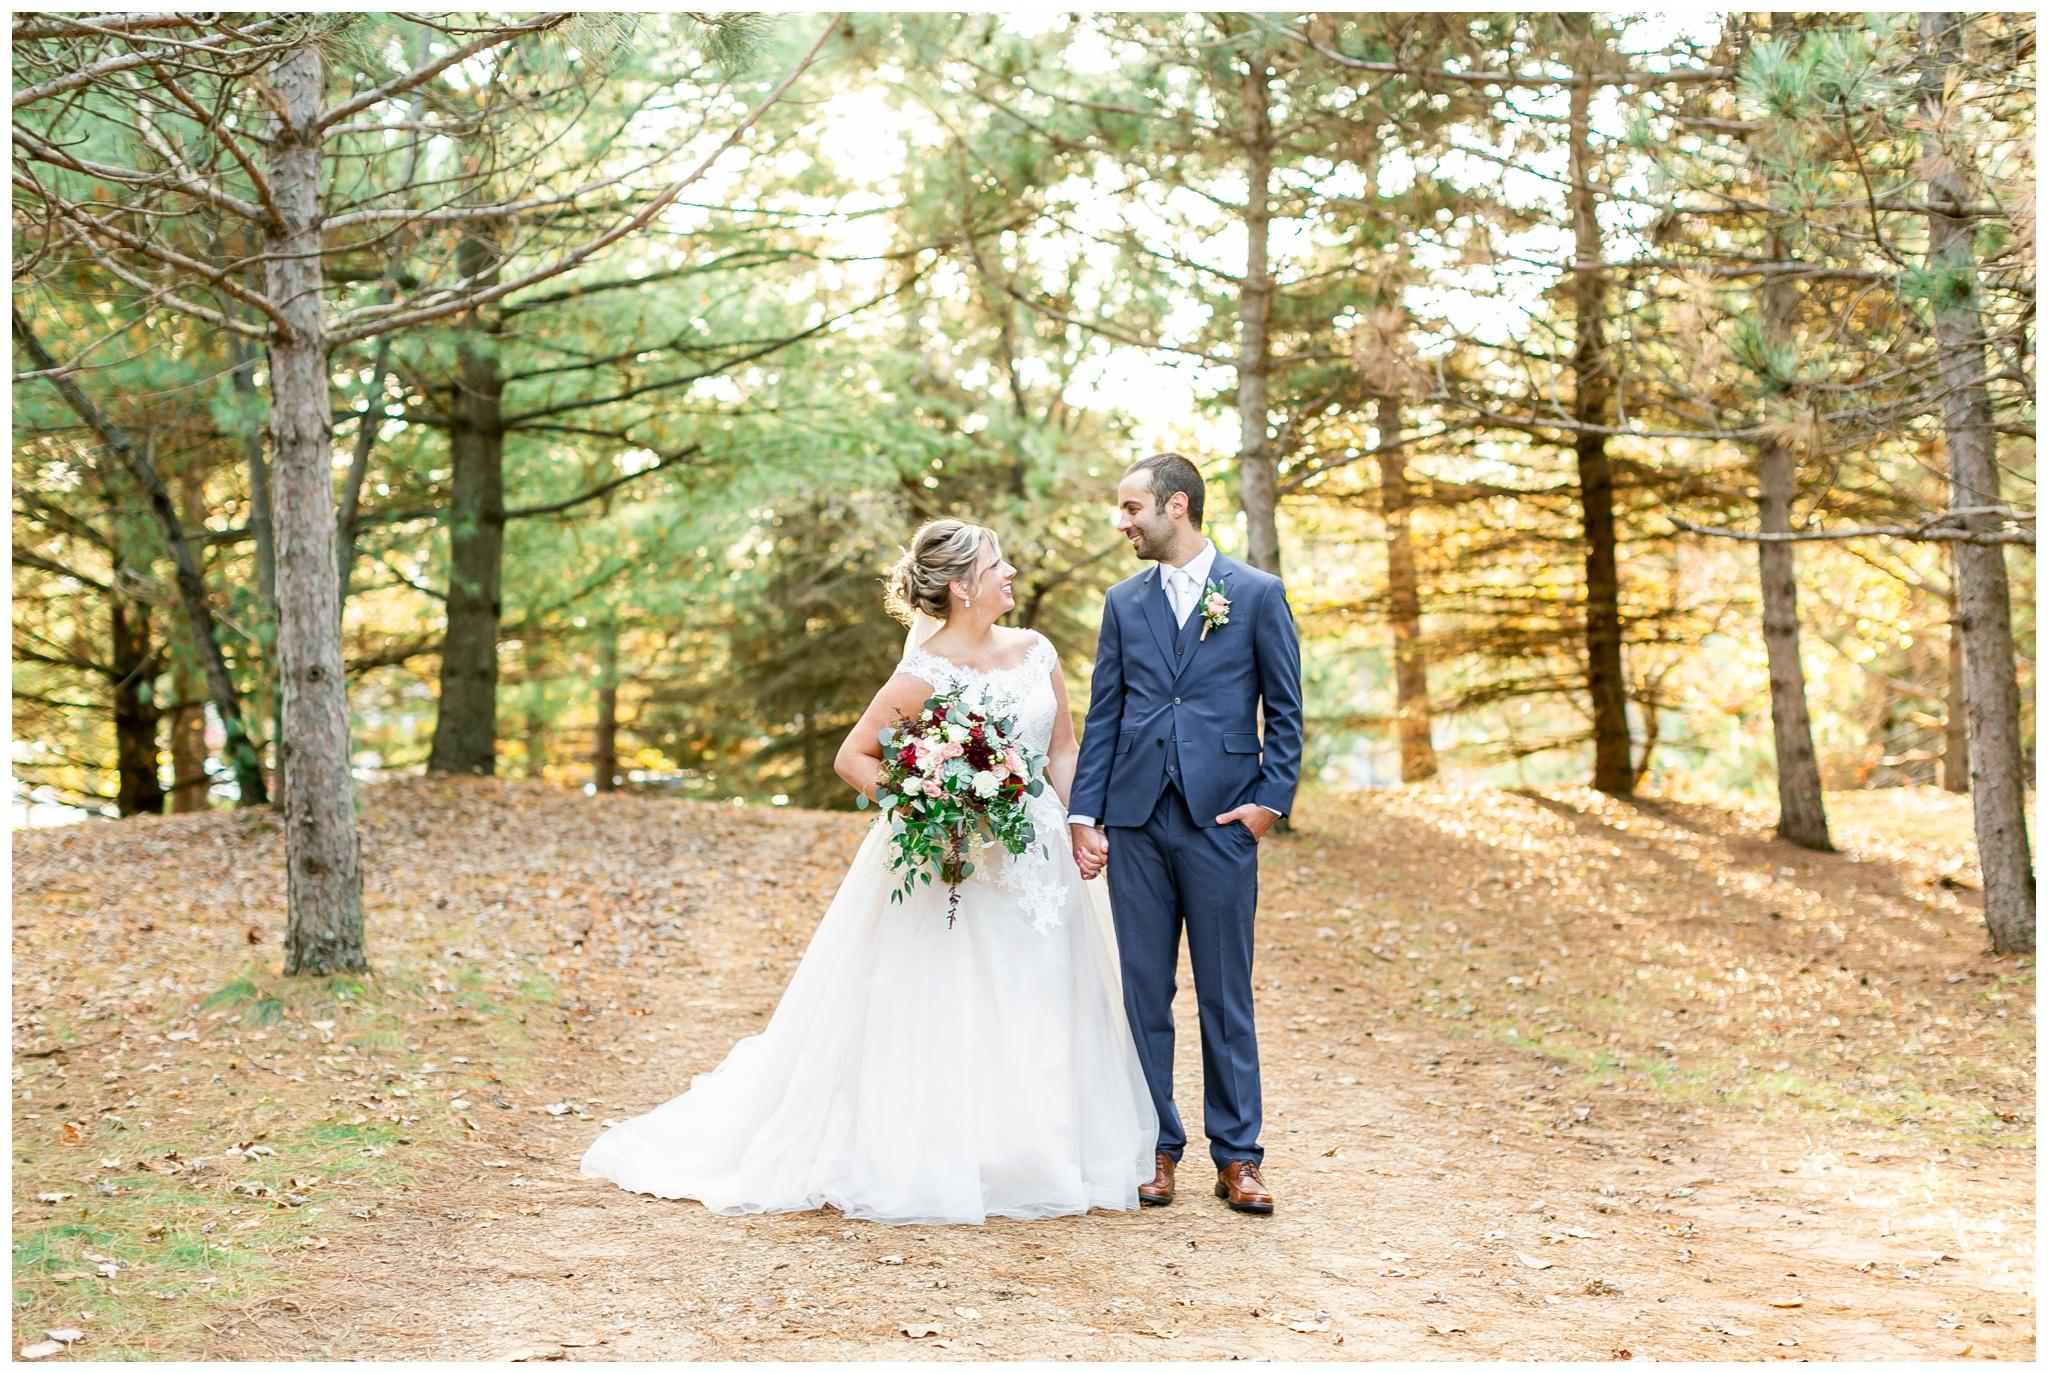 Shawano_County_park_Wedding_Caynay_Photo_Madison_Wi_2330.jpg